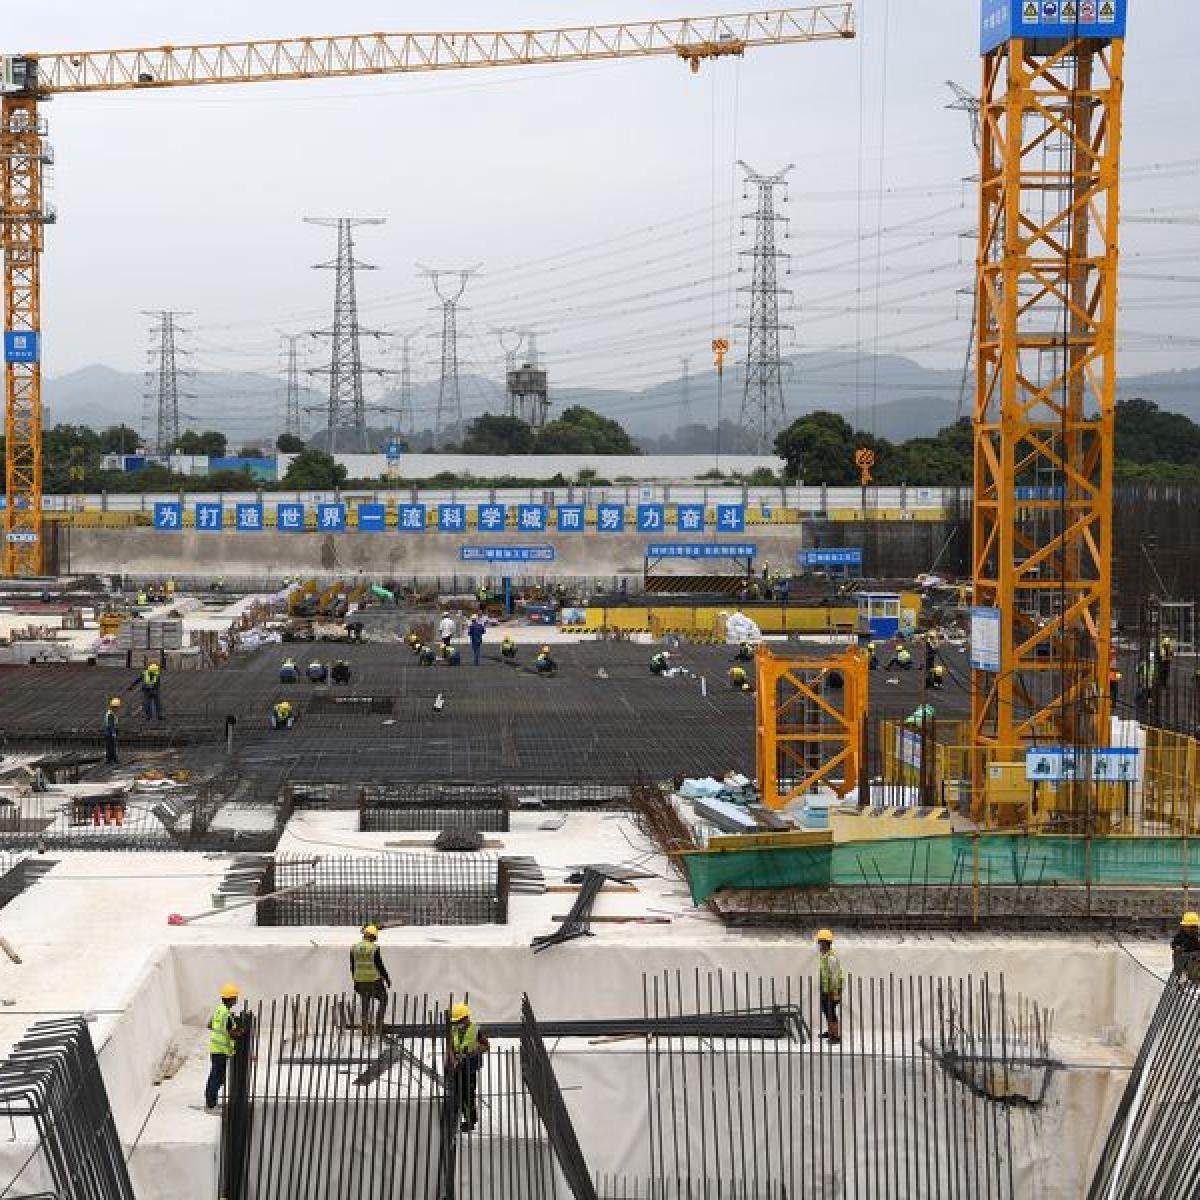 Madhya Pradesh's industries take baby steps towards normalcy amid corona crisis